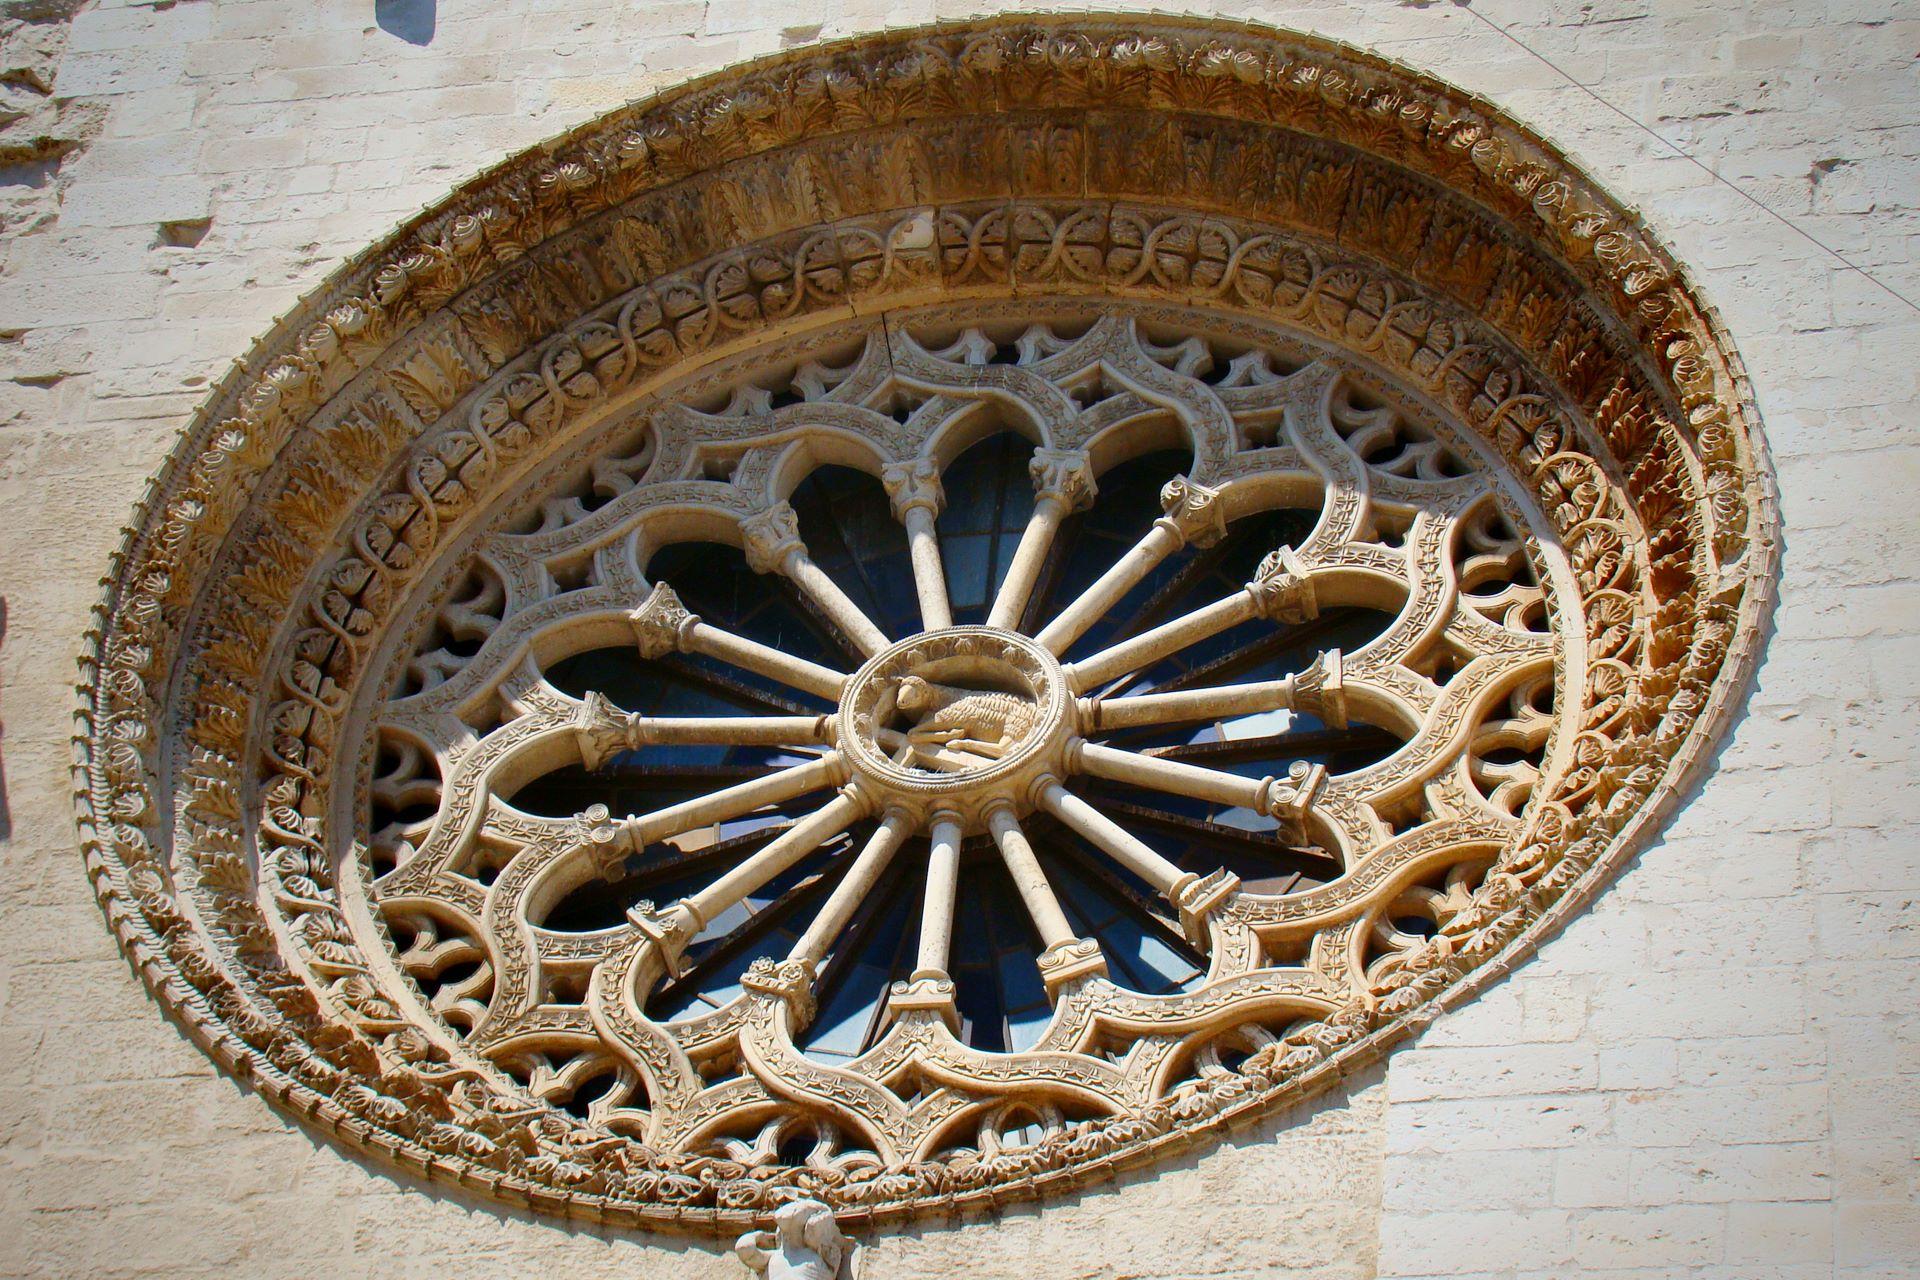 apulia slow travel rosone rosette rose window cattedrale altamura romanico romanesque romanik federico II friedrich II frederick II hohenstaufen arte architettura svevo puglia apulien murgia